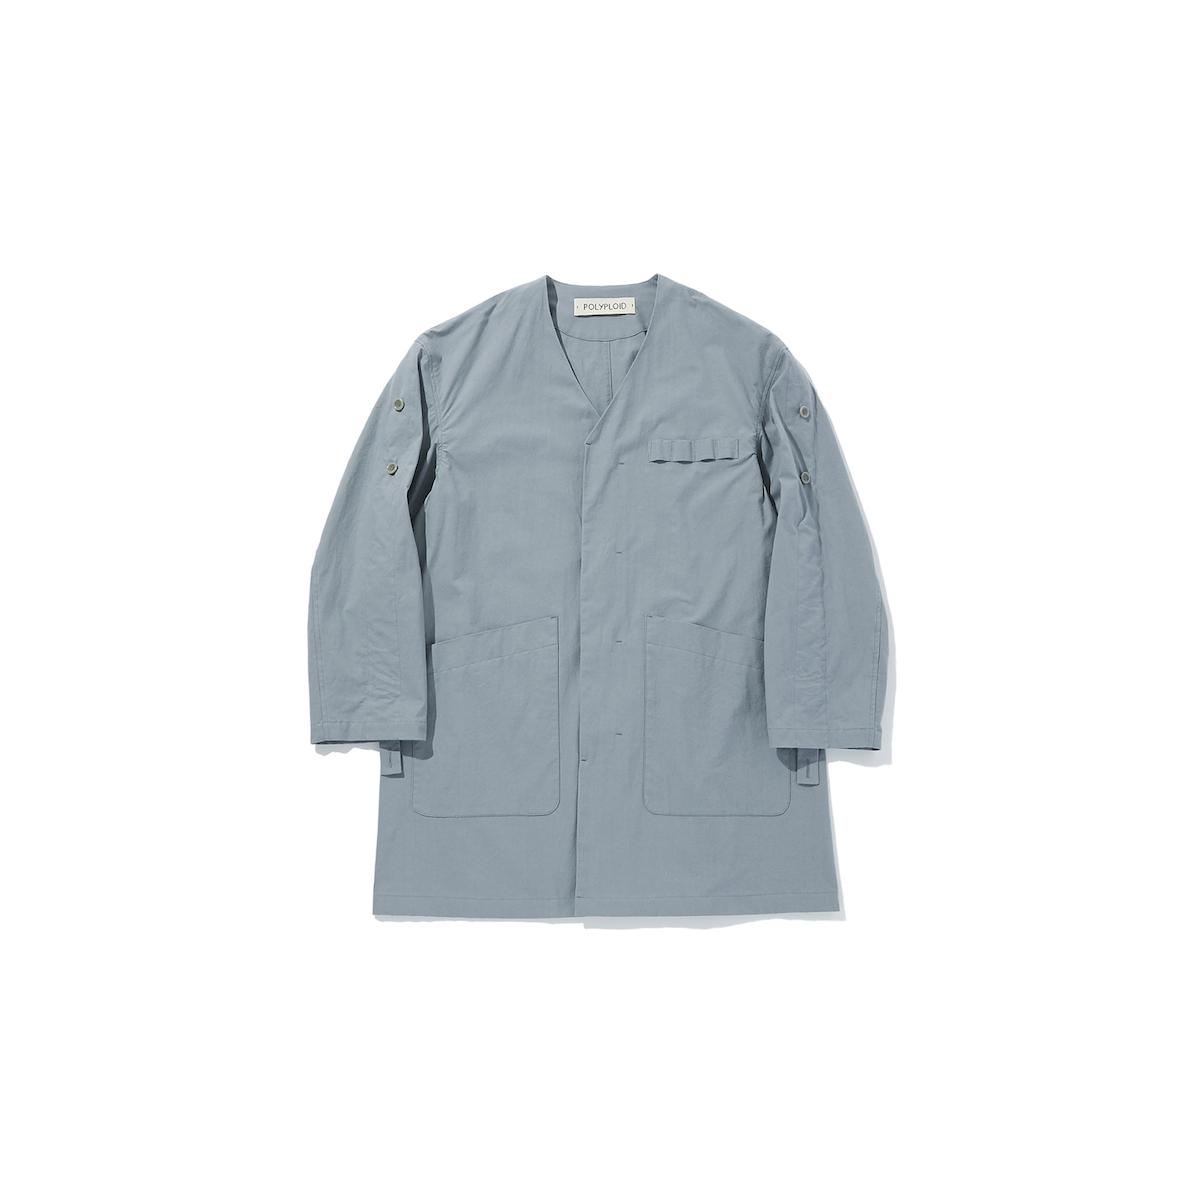 POLYPLOID 「 ATELIER COAT TYPE-C : 2021SS / BLUE GRAY 」